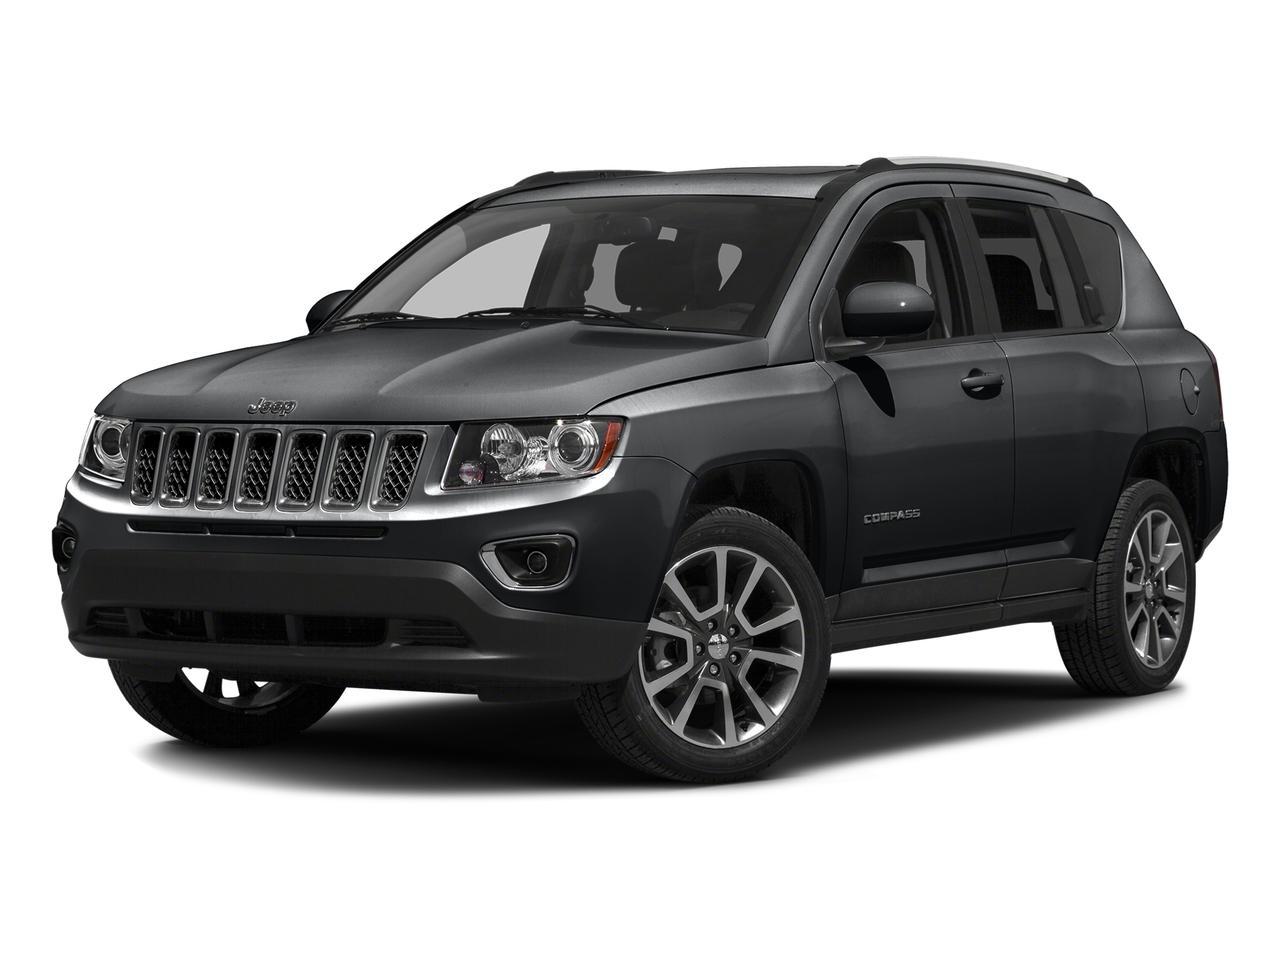 2016 Jeep Compass Vehicle Photo in OAK LAWN, IL 60453-2517